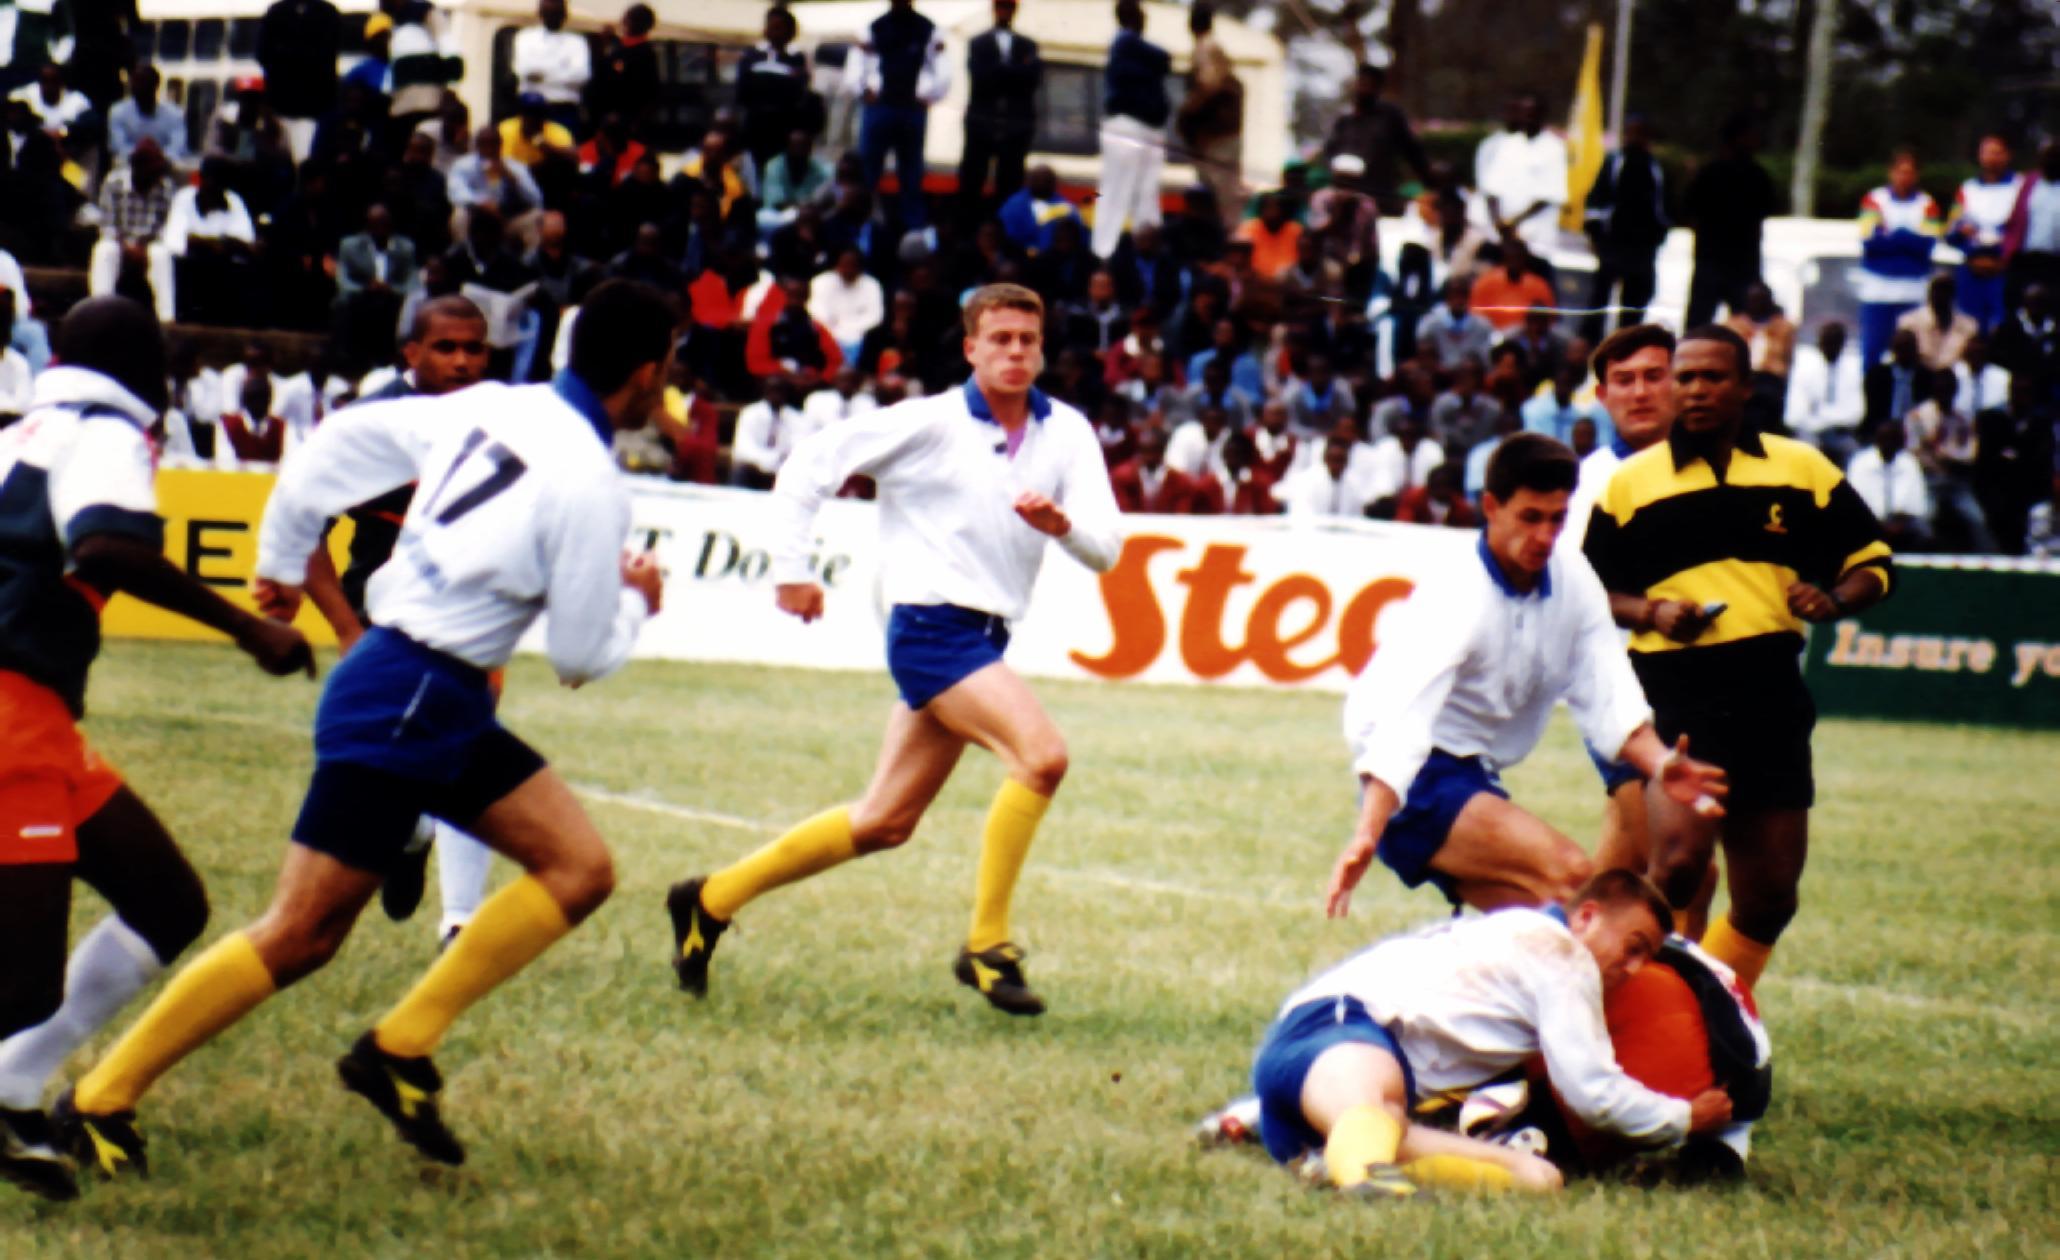 Mudiwa Mundawarara in action in Nairobi, 1995 / © Mudiwa Mundawarara